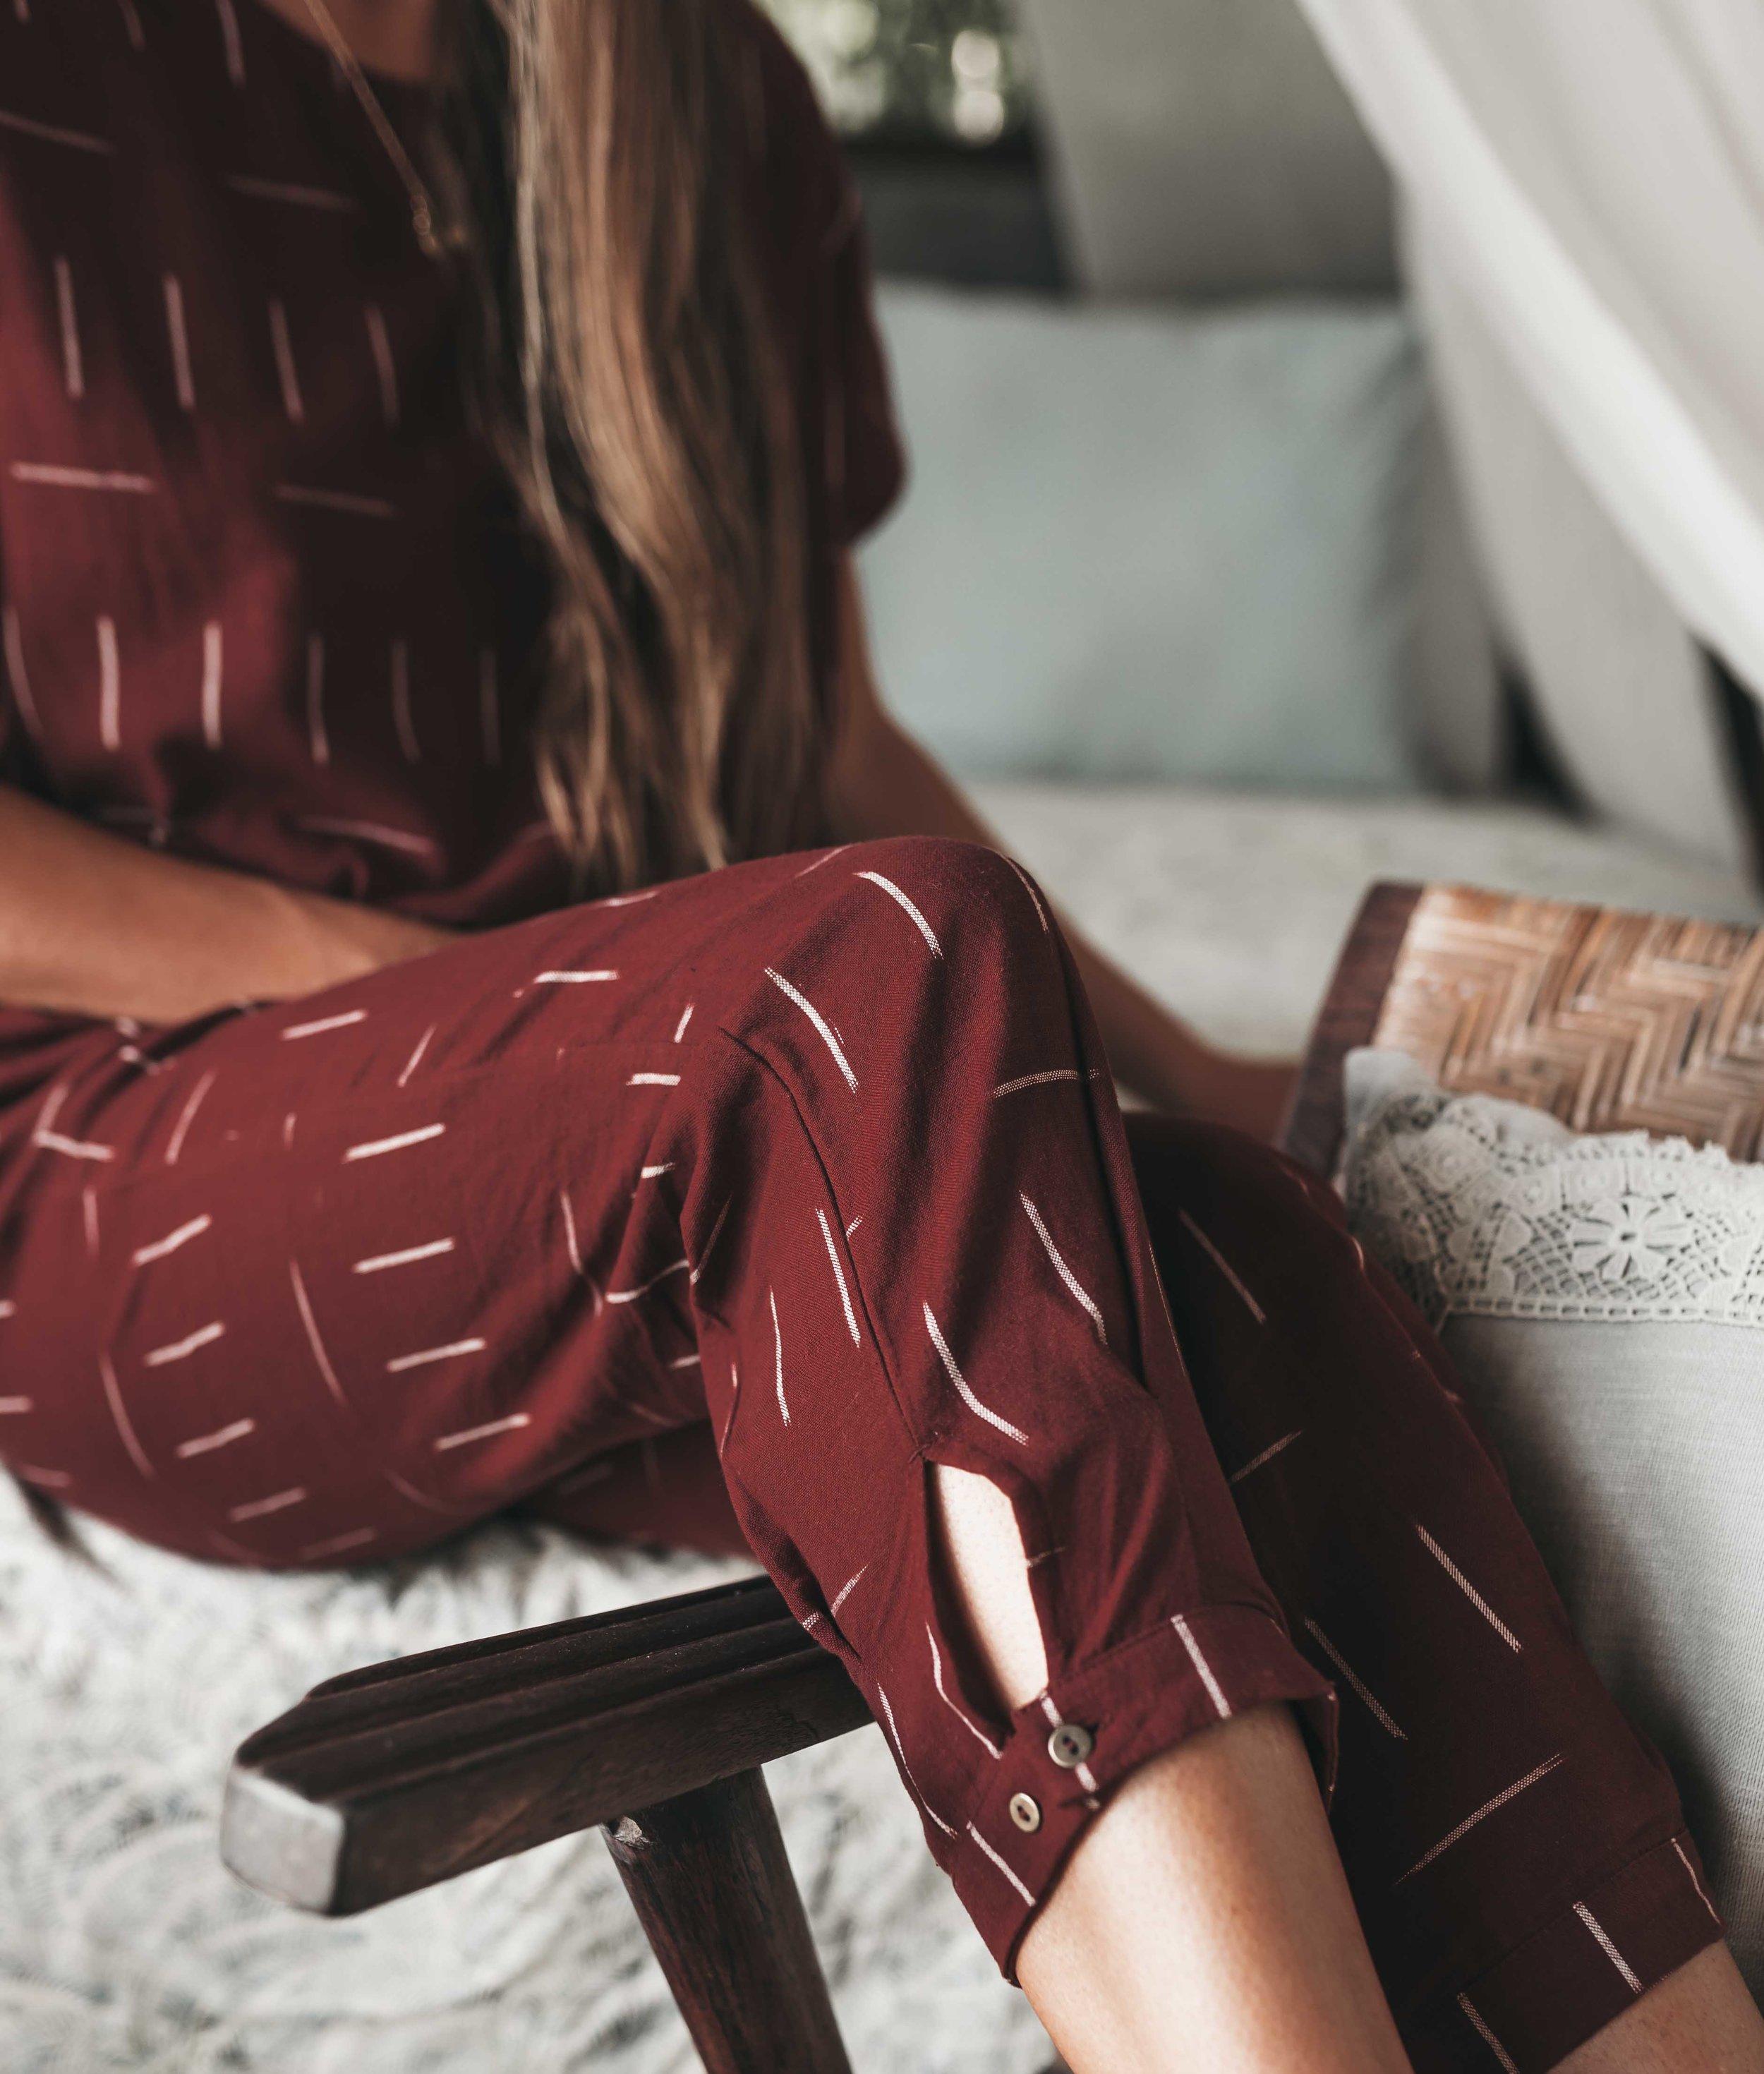 Keira-Mason-Matter-Prints-pants-details.jpg